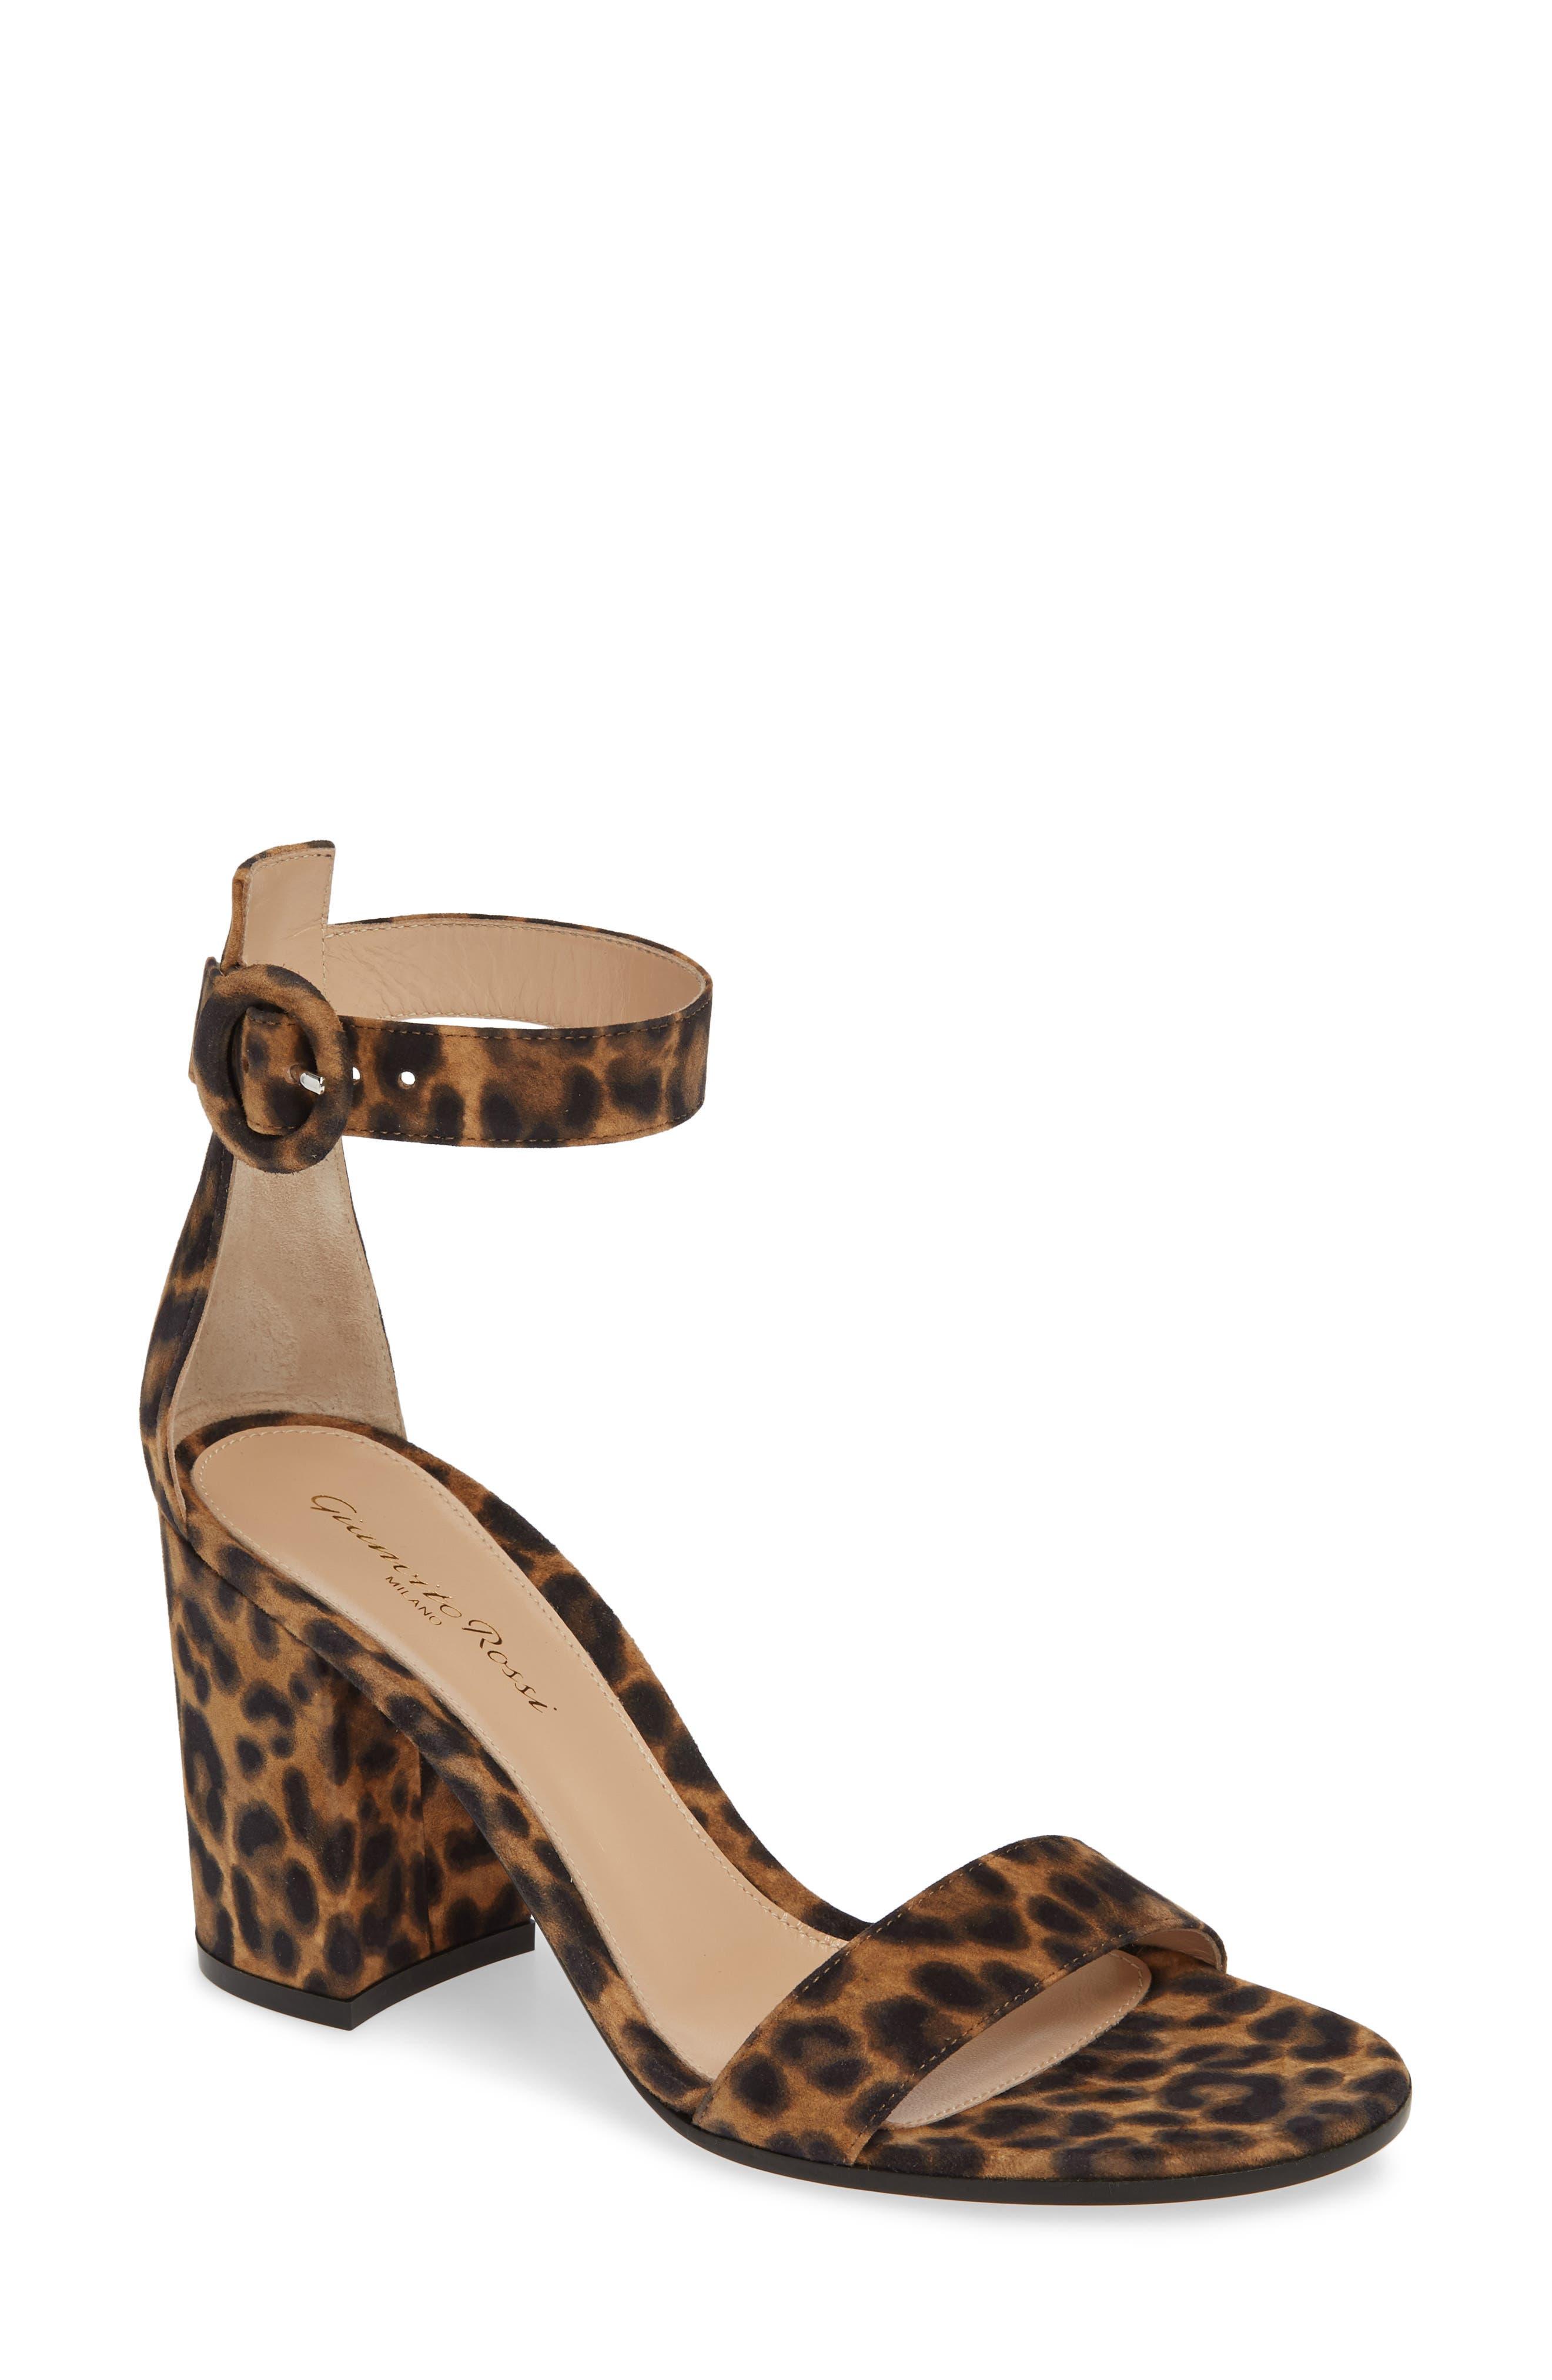 GIANVITO ROSSI, Leopard Print Ankle Strap Sandal, Main thumbnail 1, color, LEOPARD